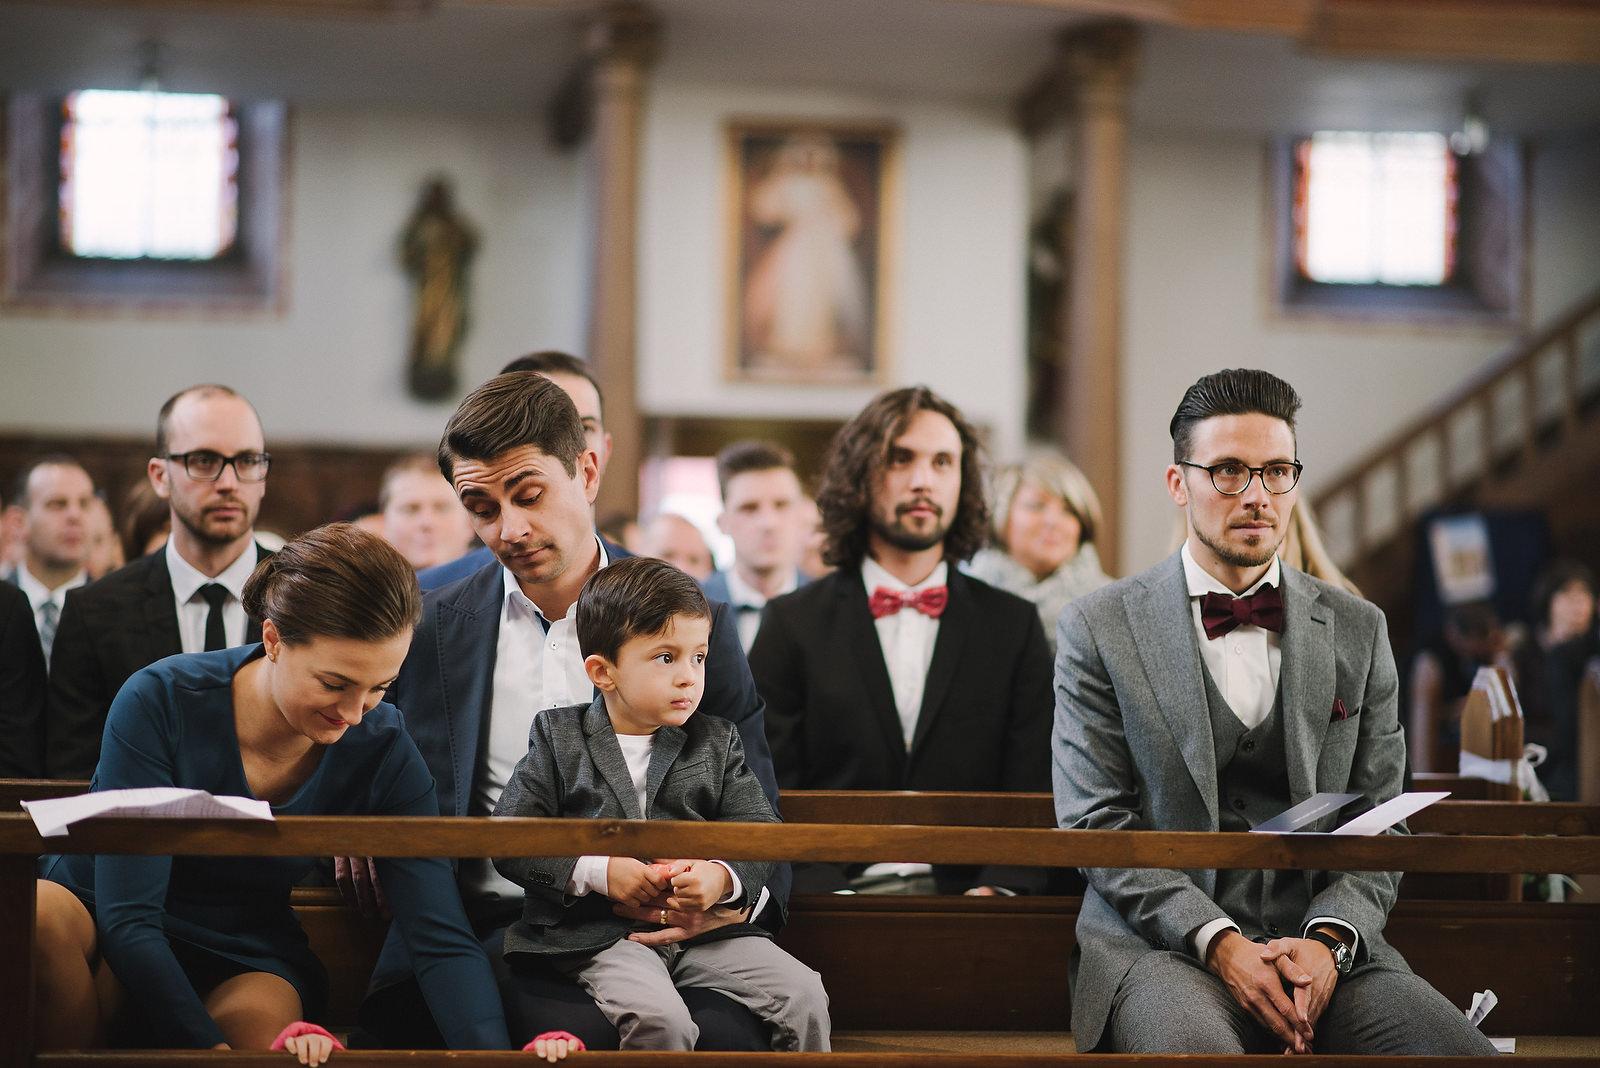 Fotograf Konstanz - Silvester Wedding in Hagnau / Friedrichshafen at Lake of Constance  - 15 -